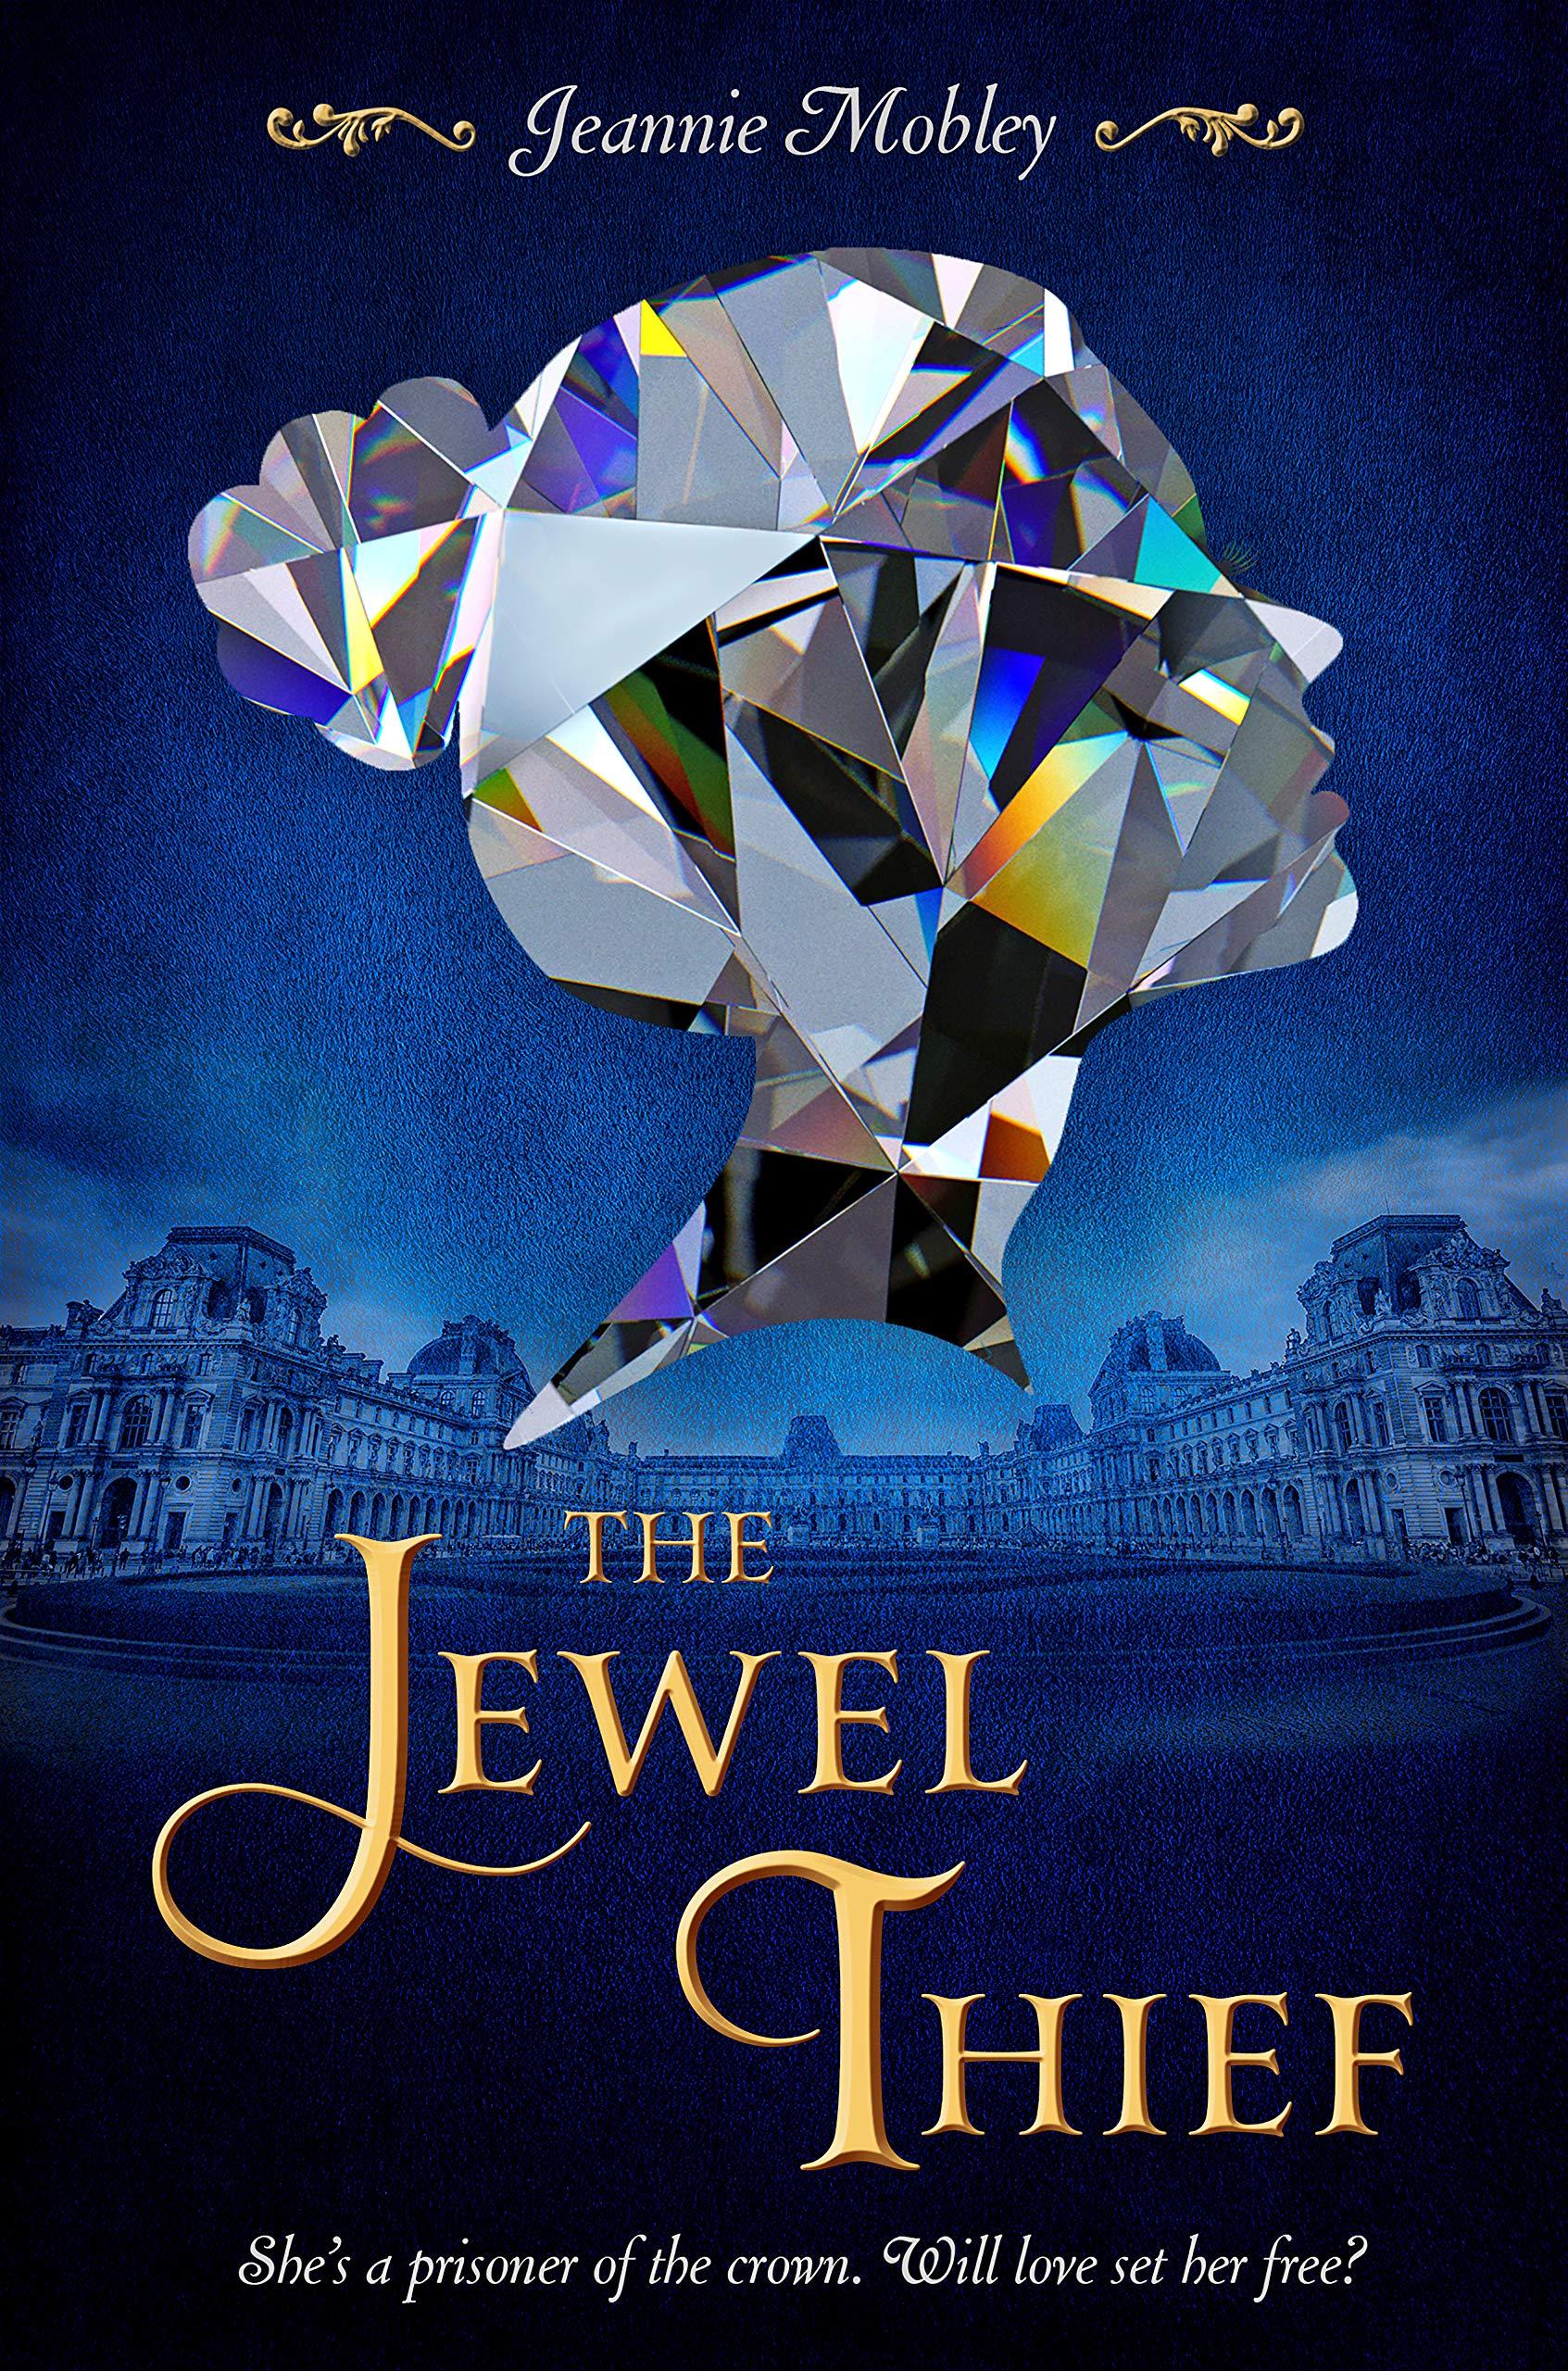 Amazon Com The Jewel Thief 9781984837417 Mobley Jeannie Books